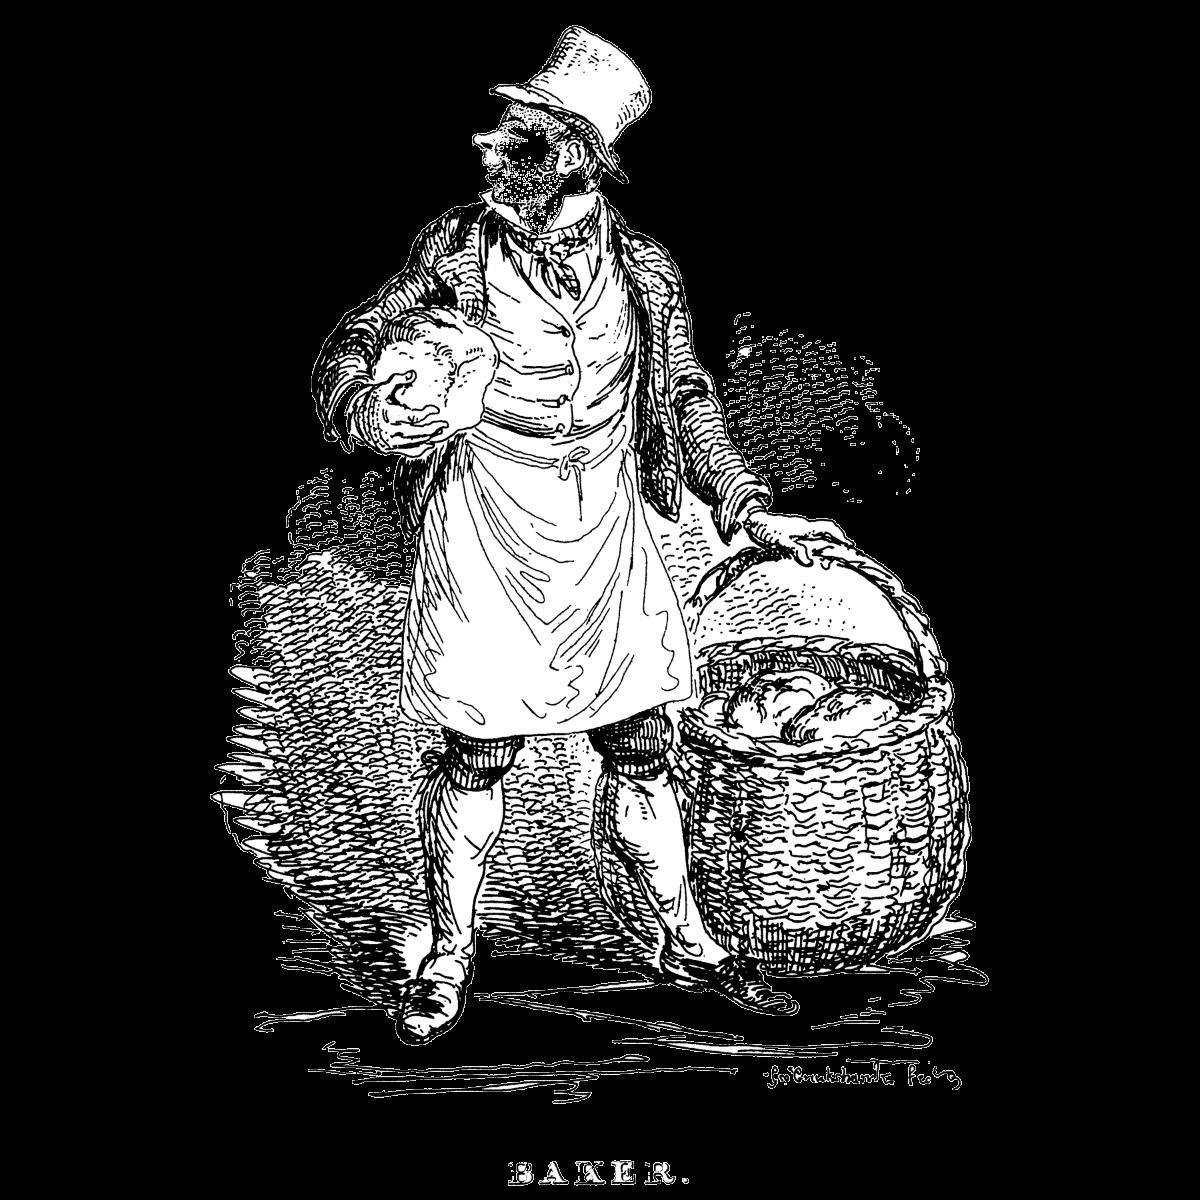 Dickens London The Folio Society